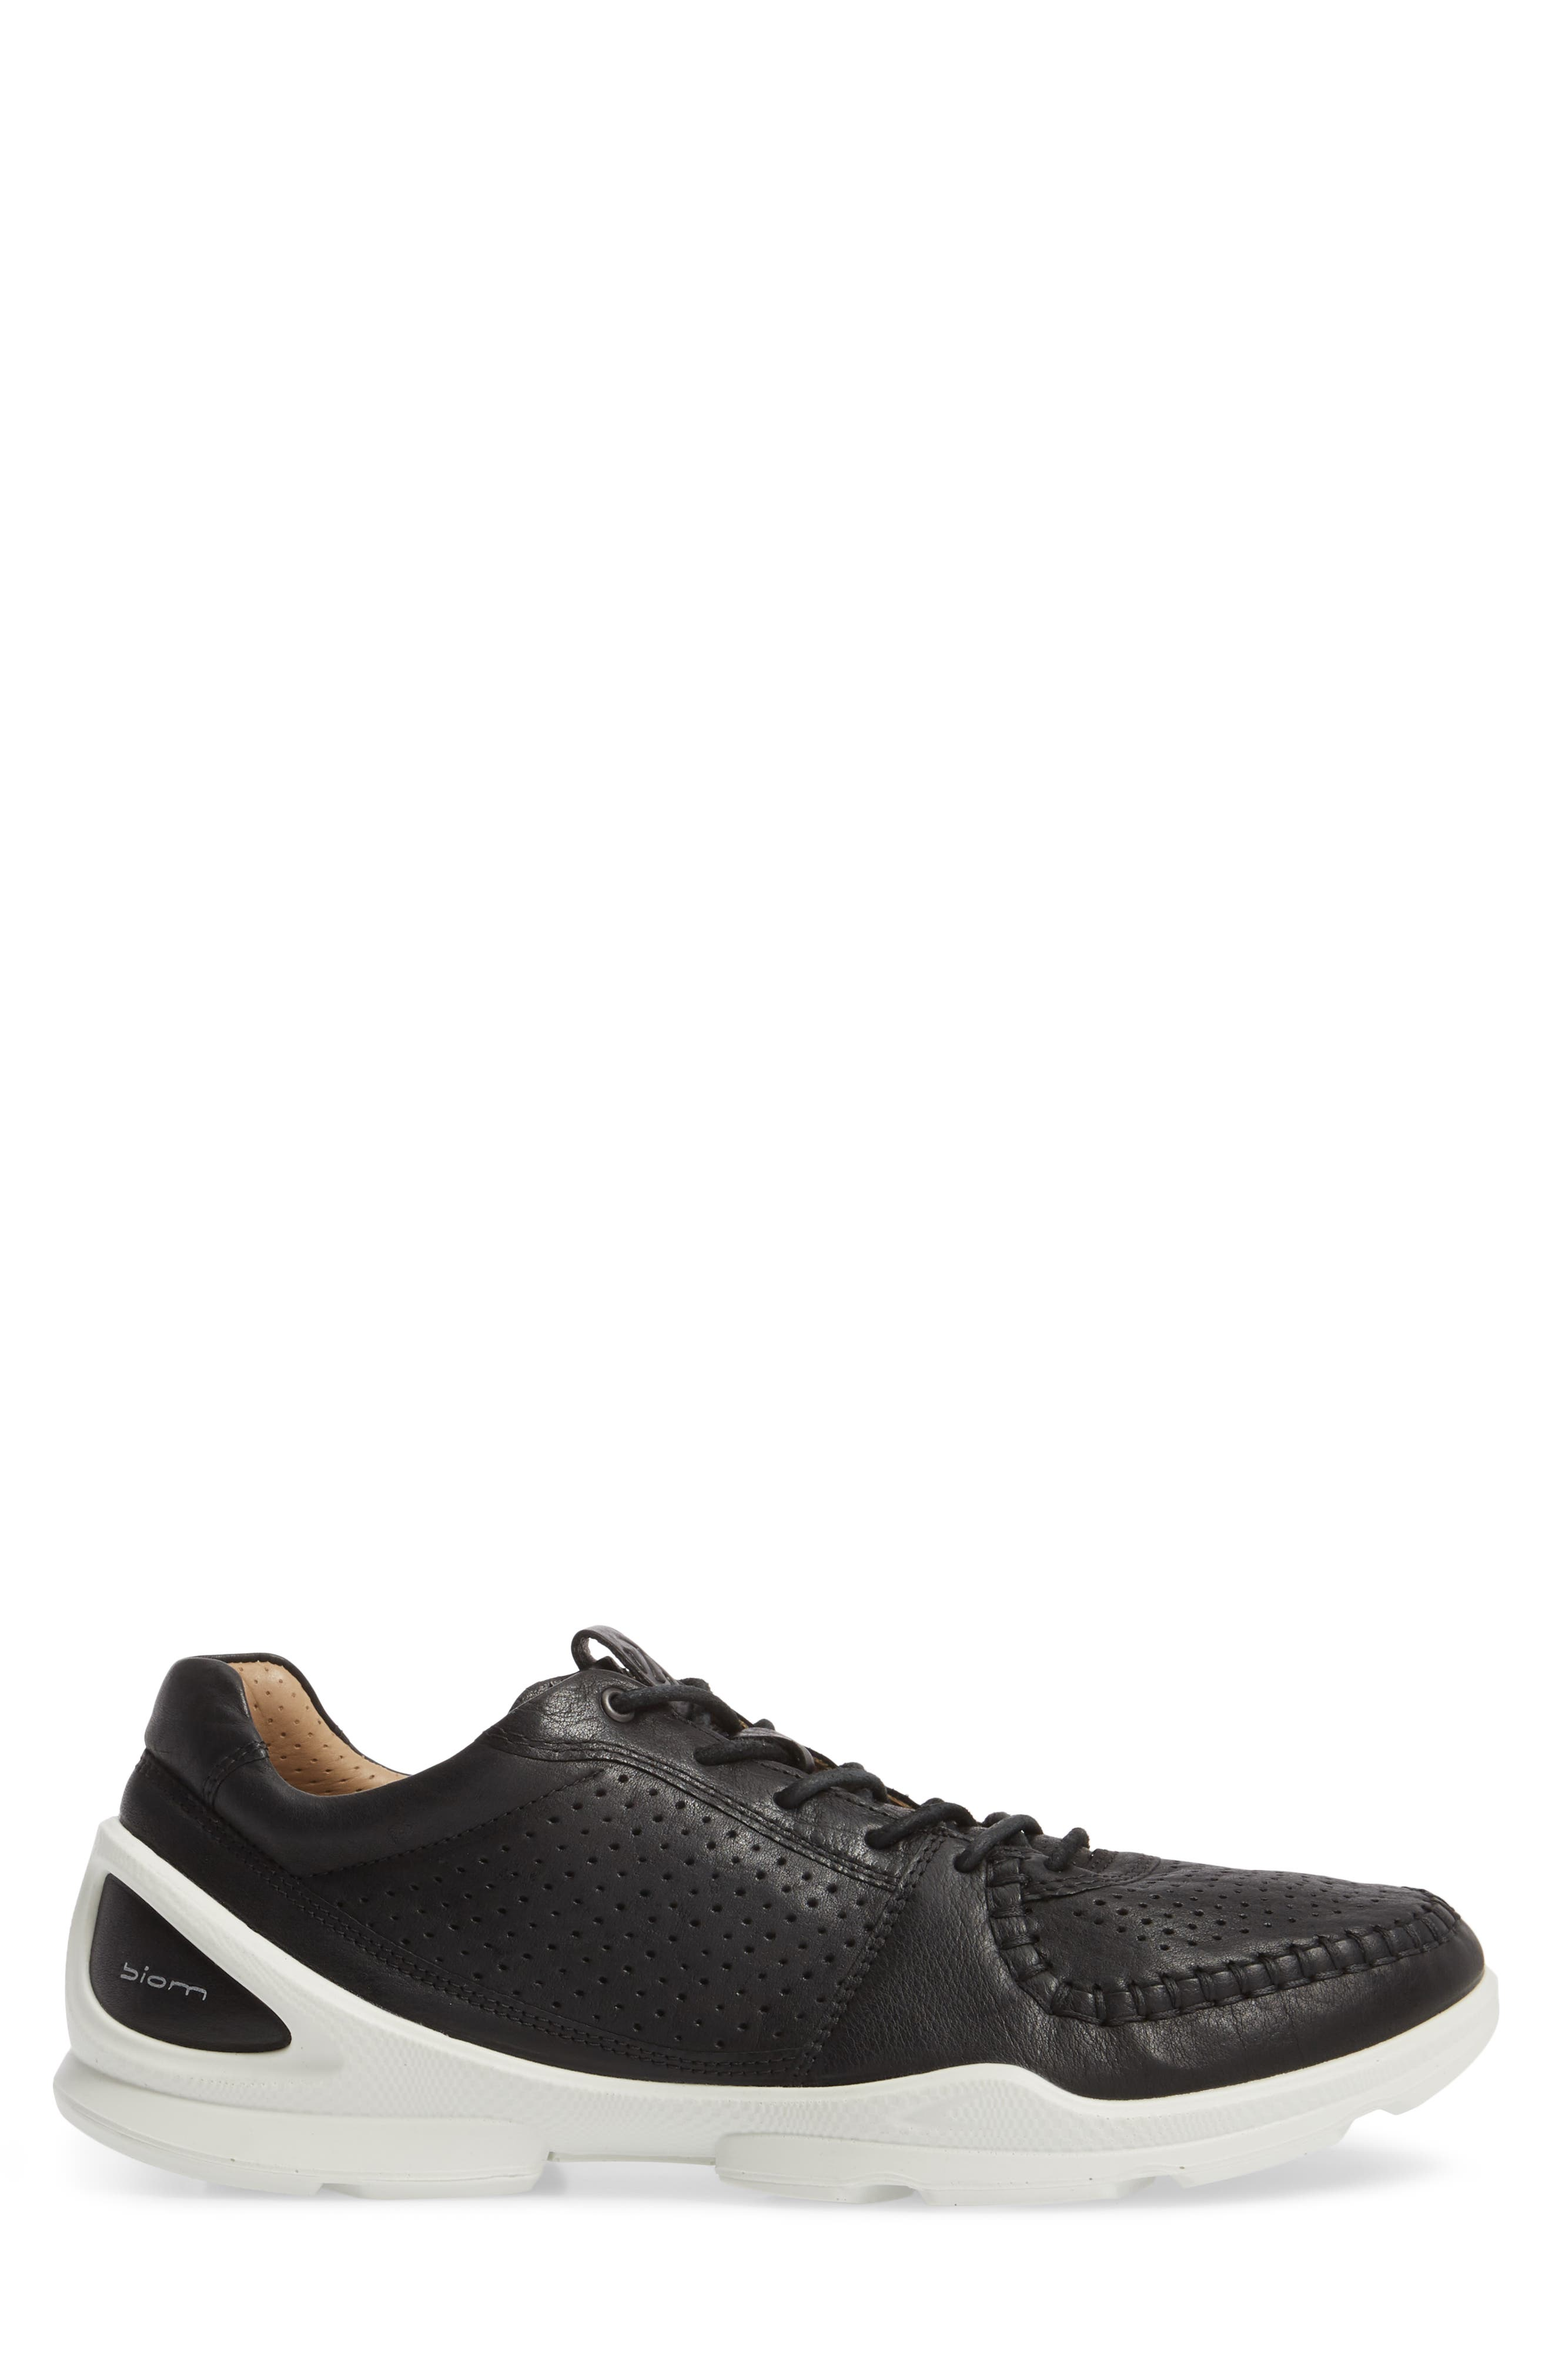 BIOM Street Moc Toe Sneaker,                             Alternate thumbnail 3, color,                             Black Leather